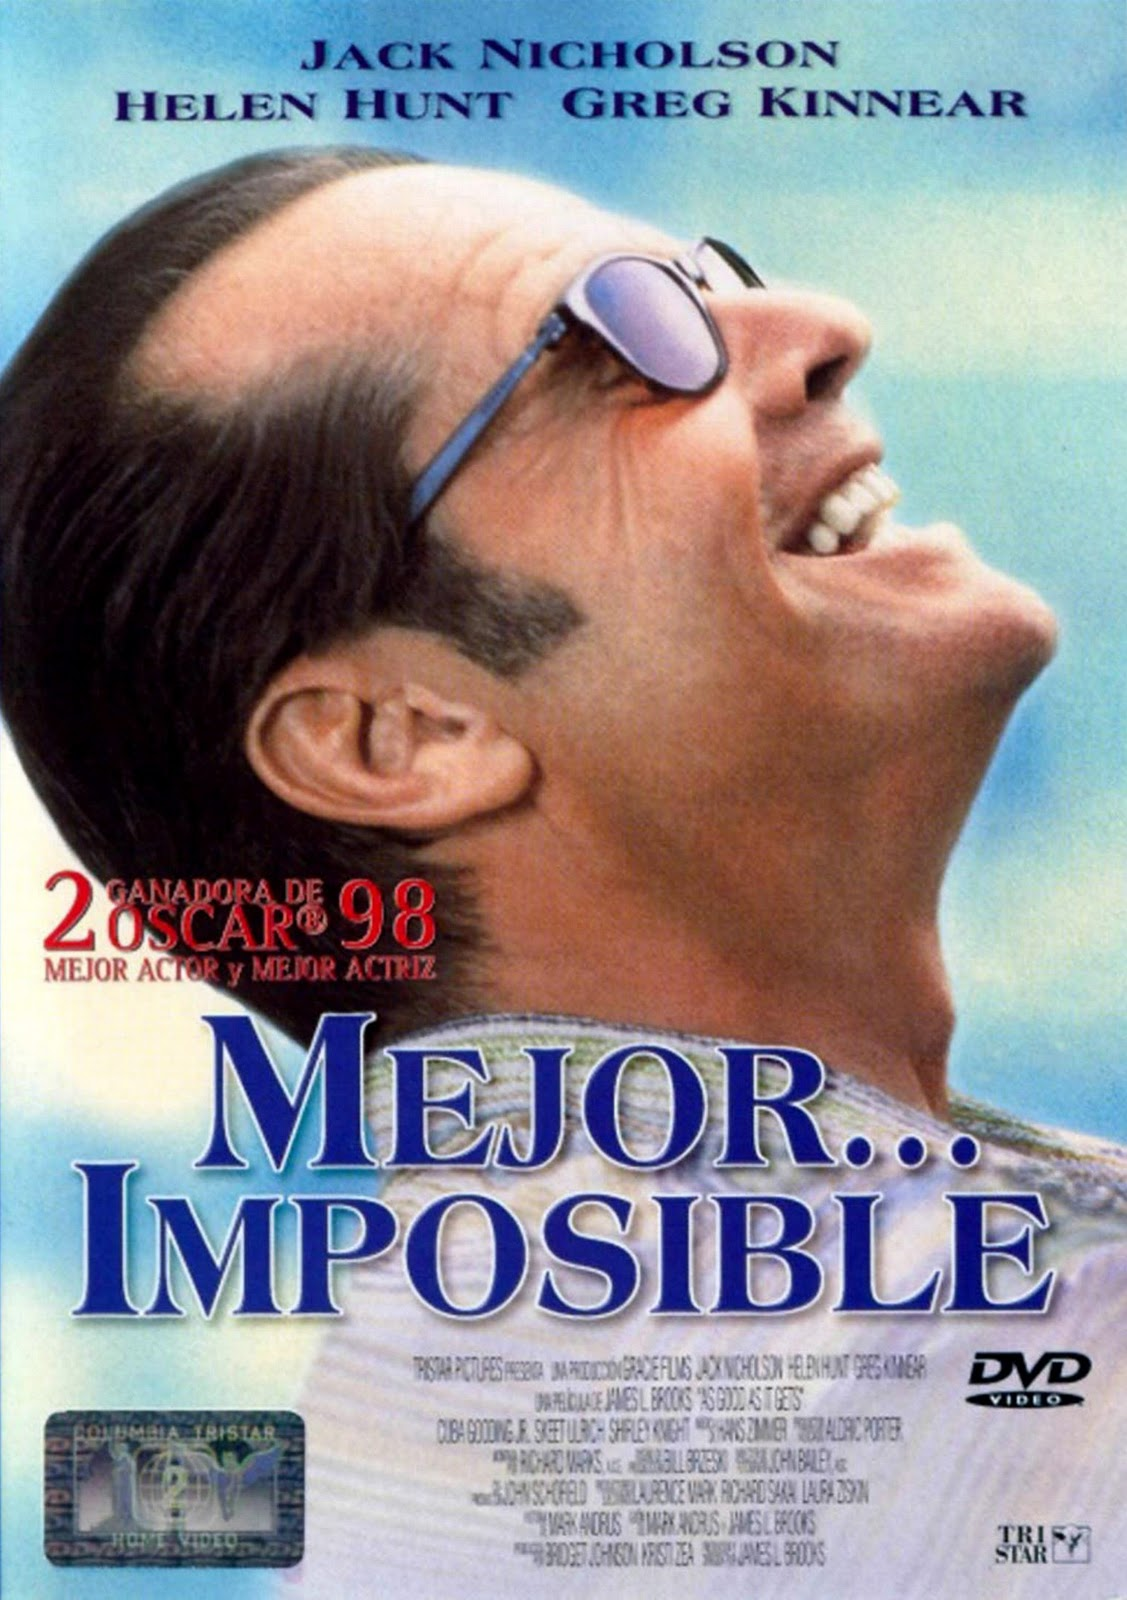 http://2.bp.blogspot.com/_pseYbbqmXE8/TTmtjx0aioI/AAAAAAAAAio/19IcykoXEE4/s1600/Mejor_Imposible.jpg